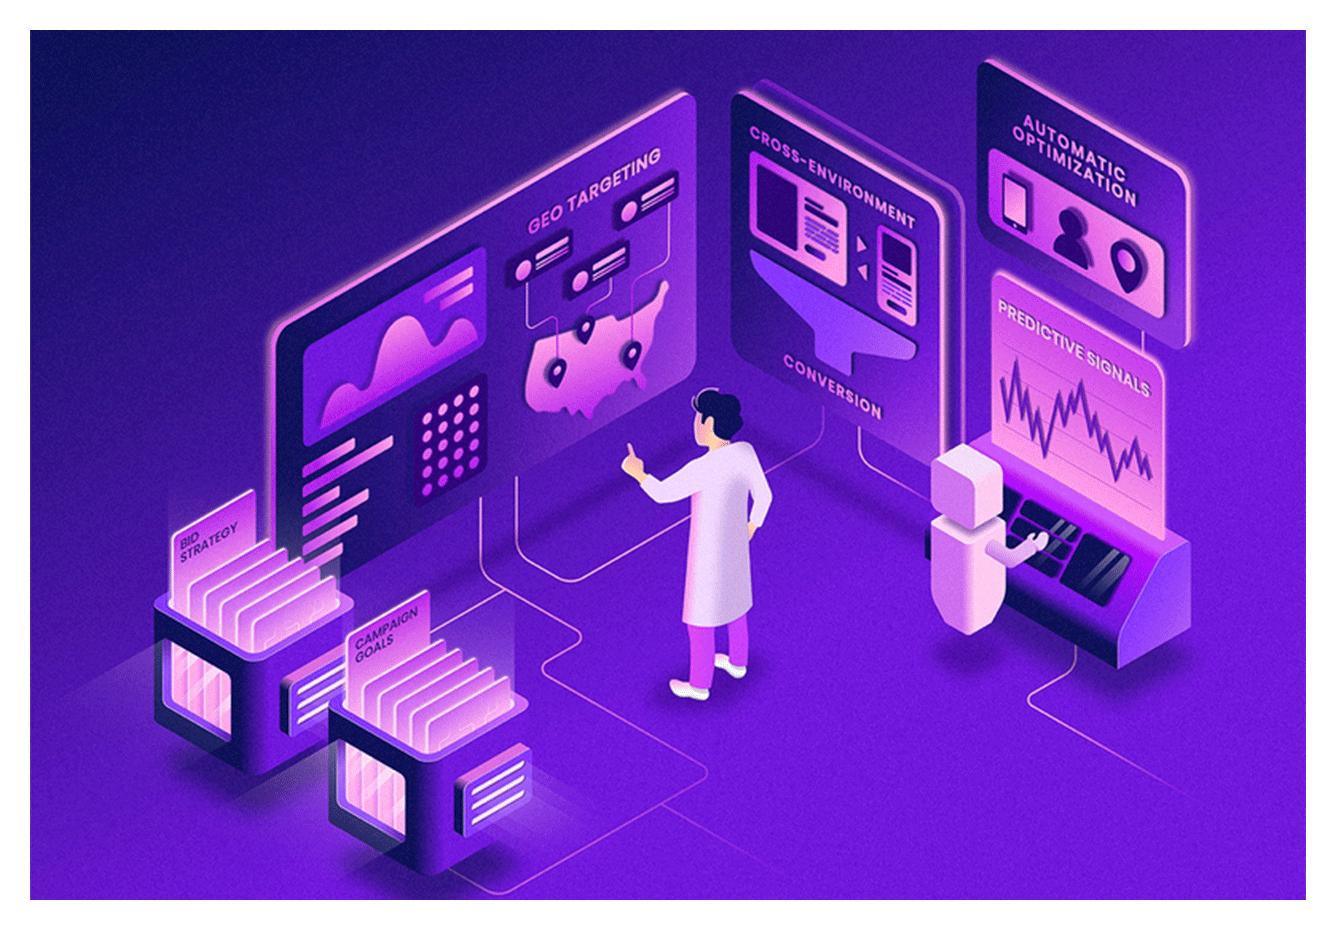 machine learning understand customer behavior